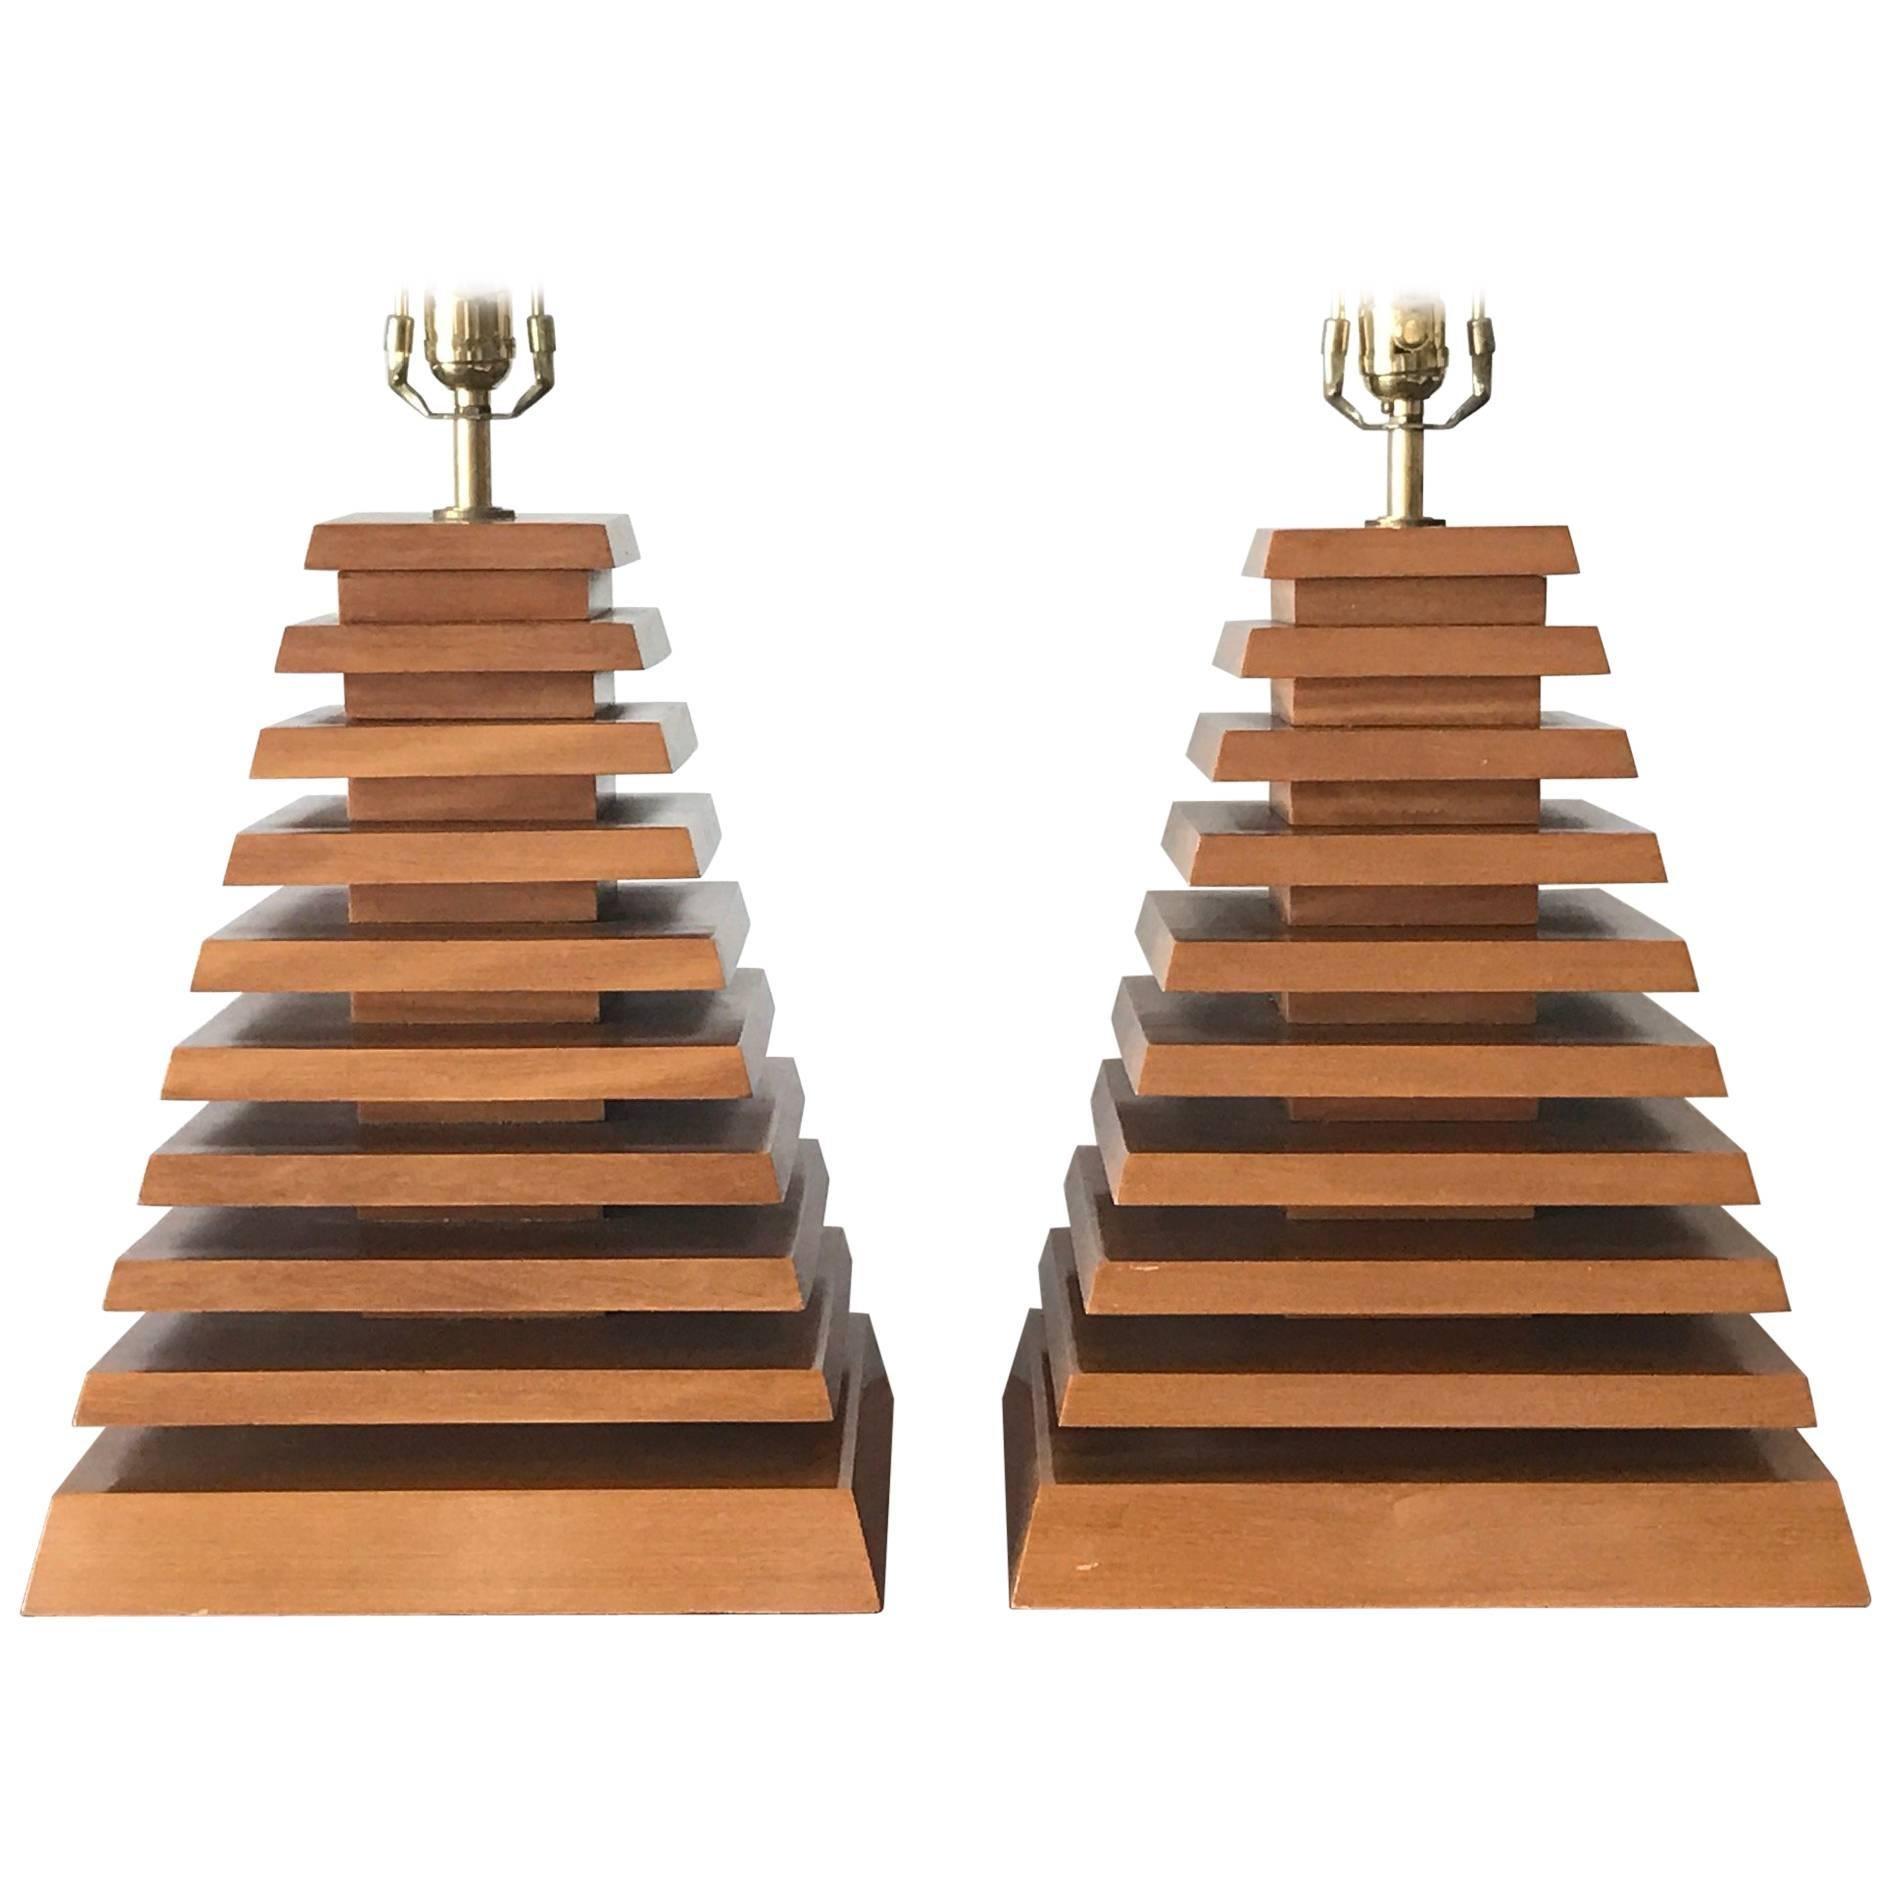 Pair of Unusual Pyramid Lamps